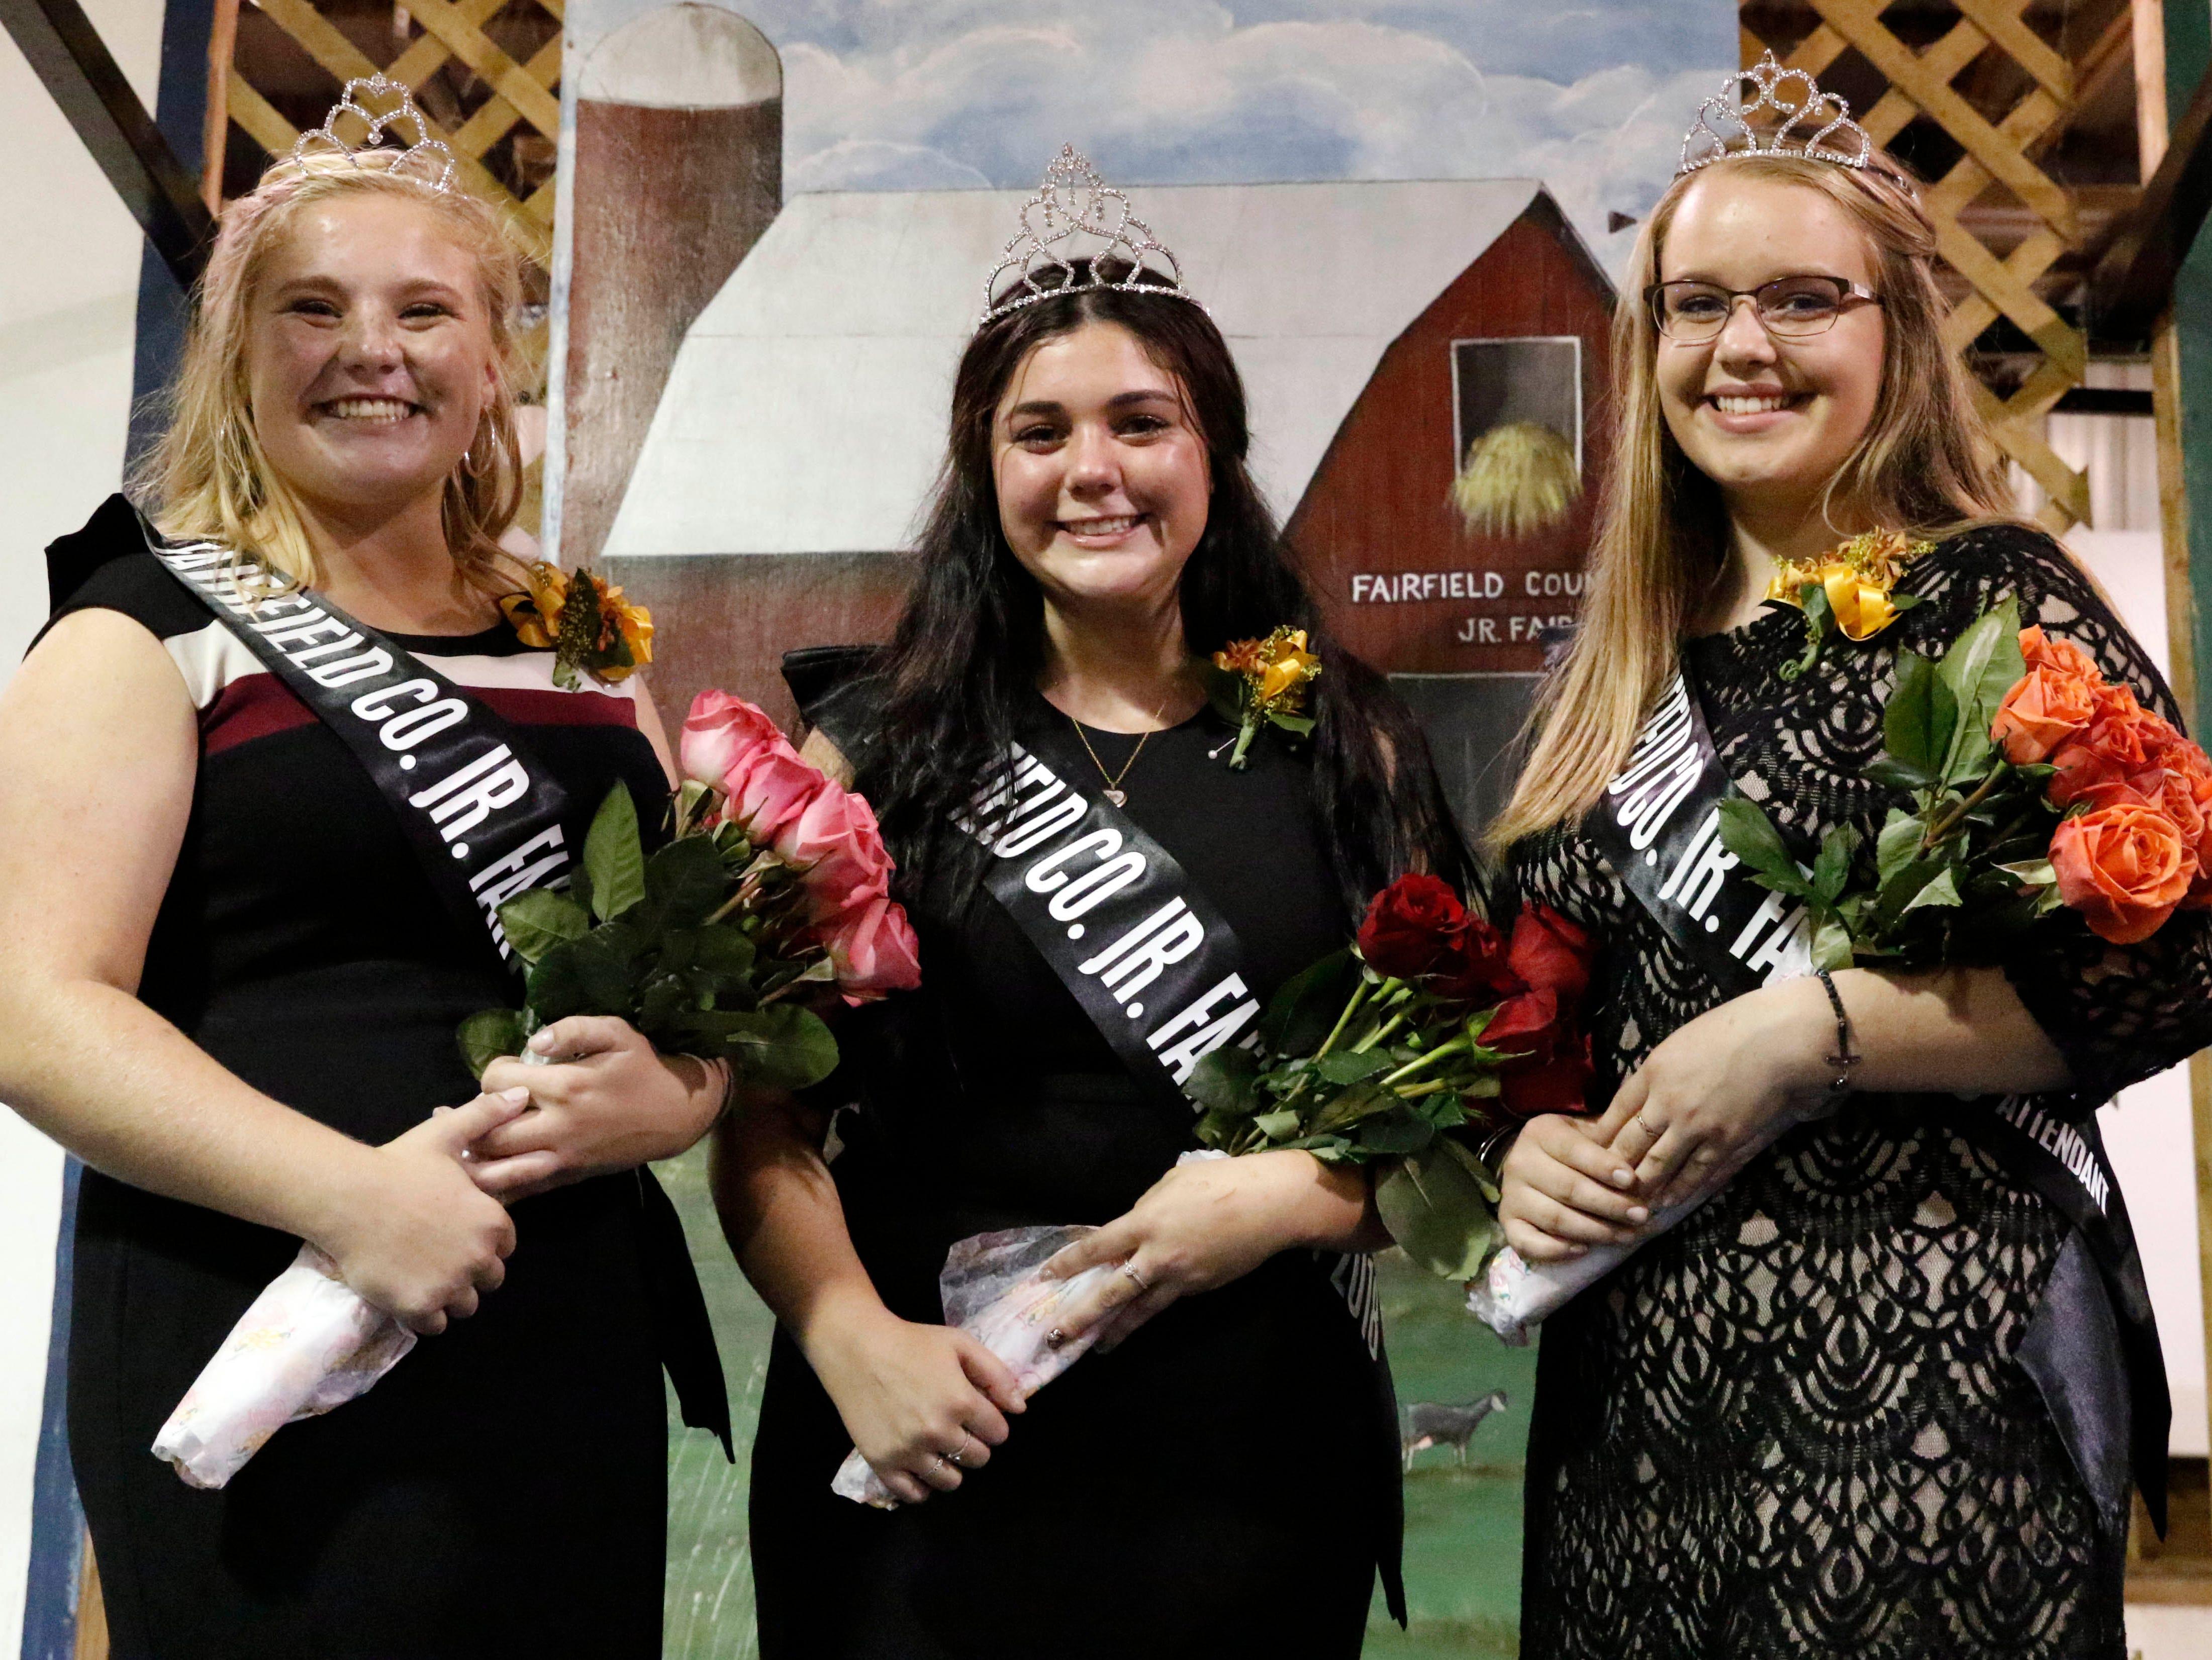 Hayley Richardson, center, the 2018 Junior Fair Queen stands between Second Attendant Tatum Campbell, left, and First Attendant Allie Poston.